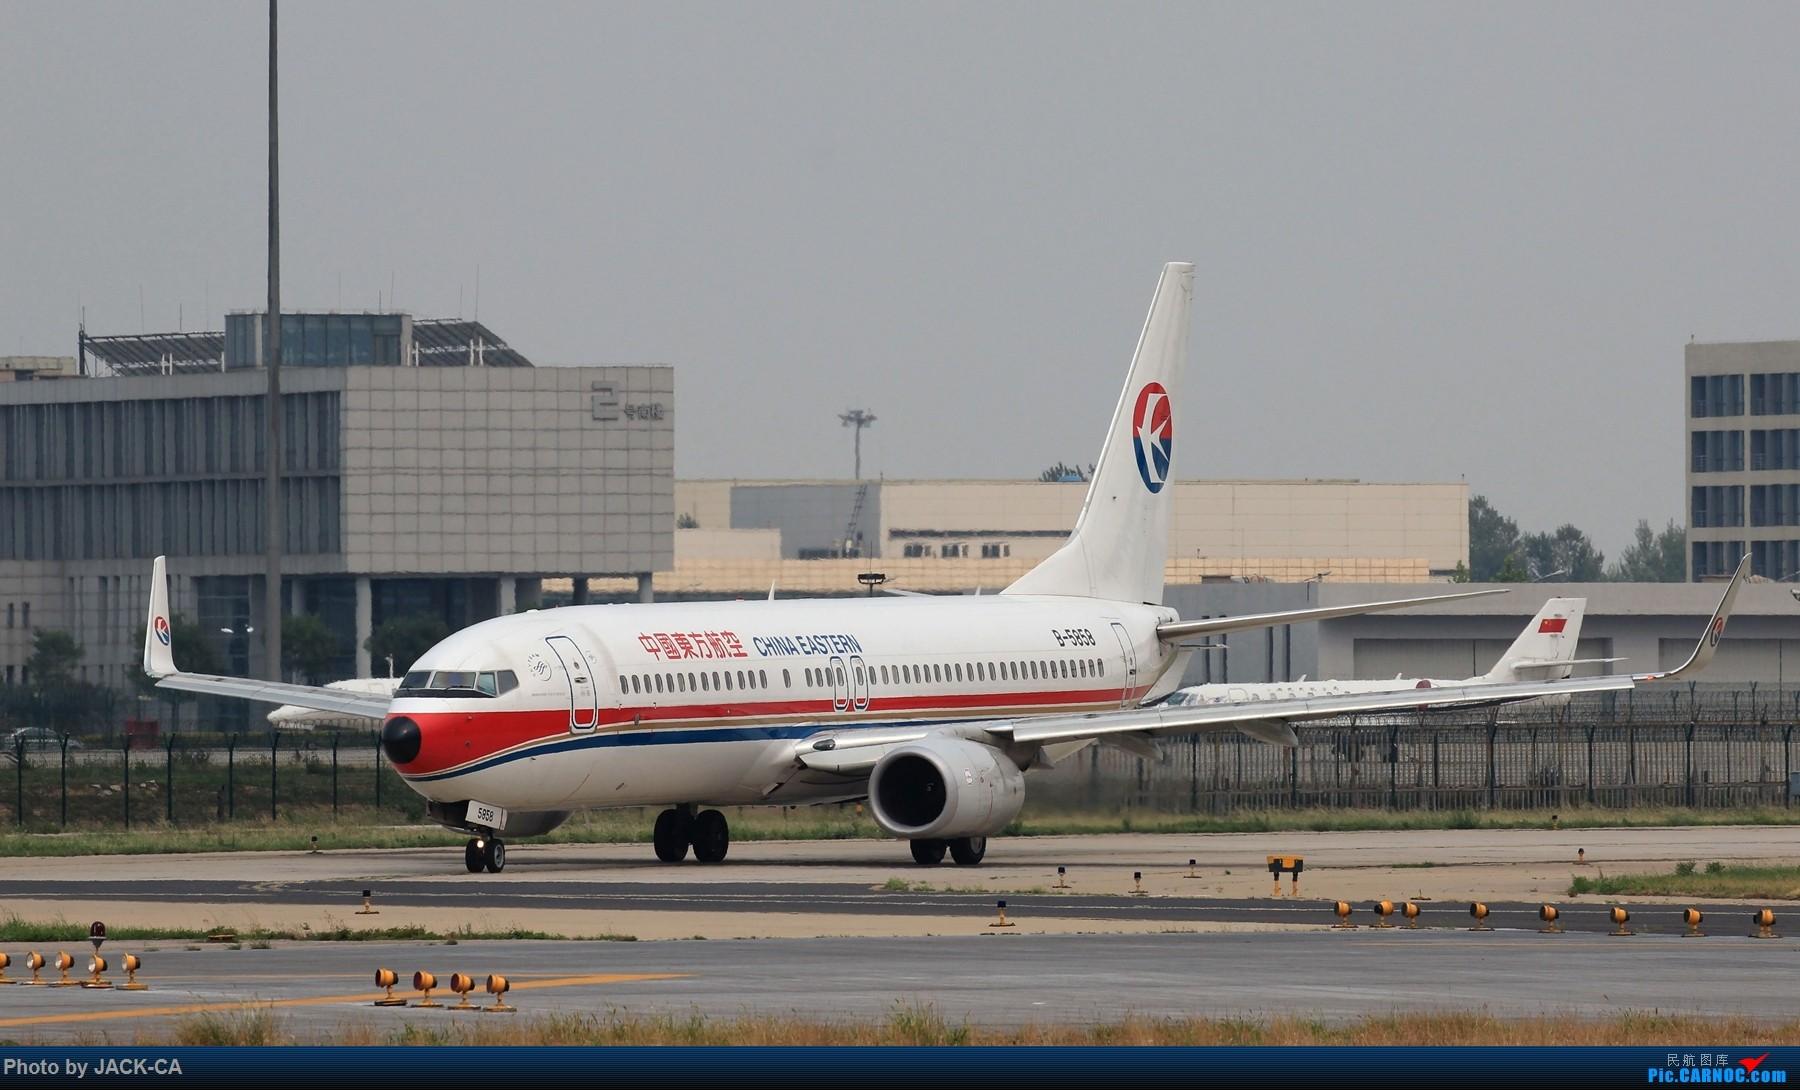 Re:【飞机1返1】厦航天合+闪灯四大航 ps国航hhh~ BOEING 737-800 B-5858 中国北京首都国际机场